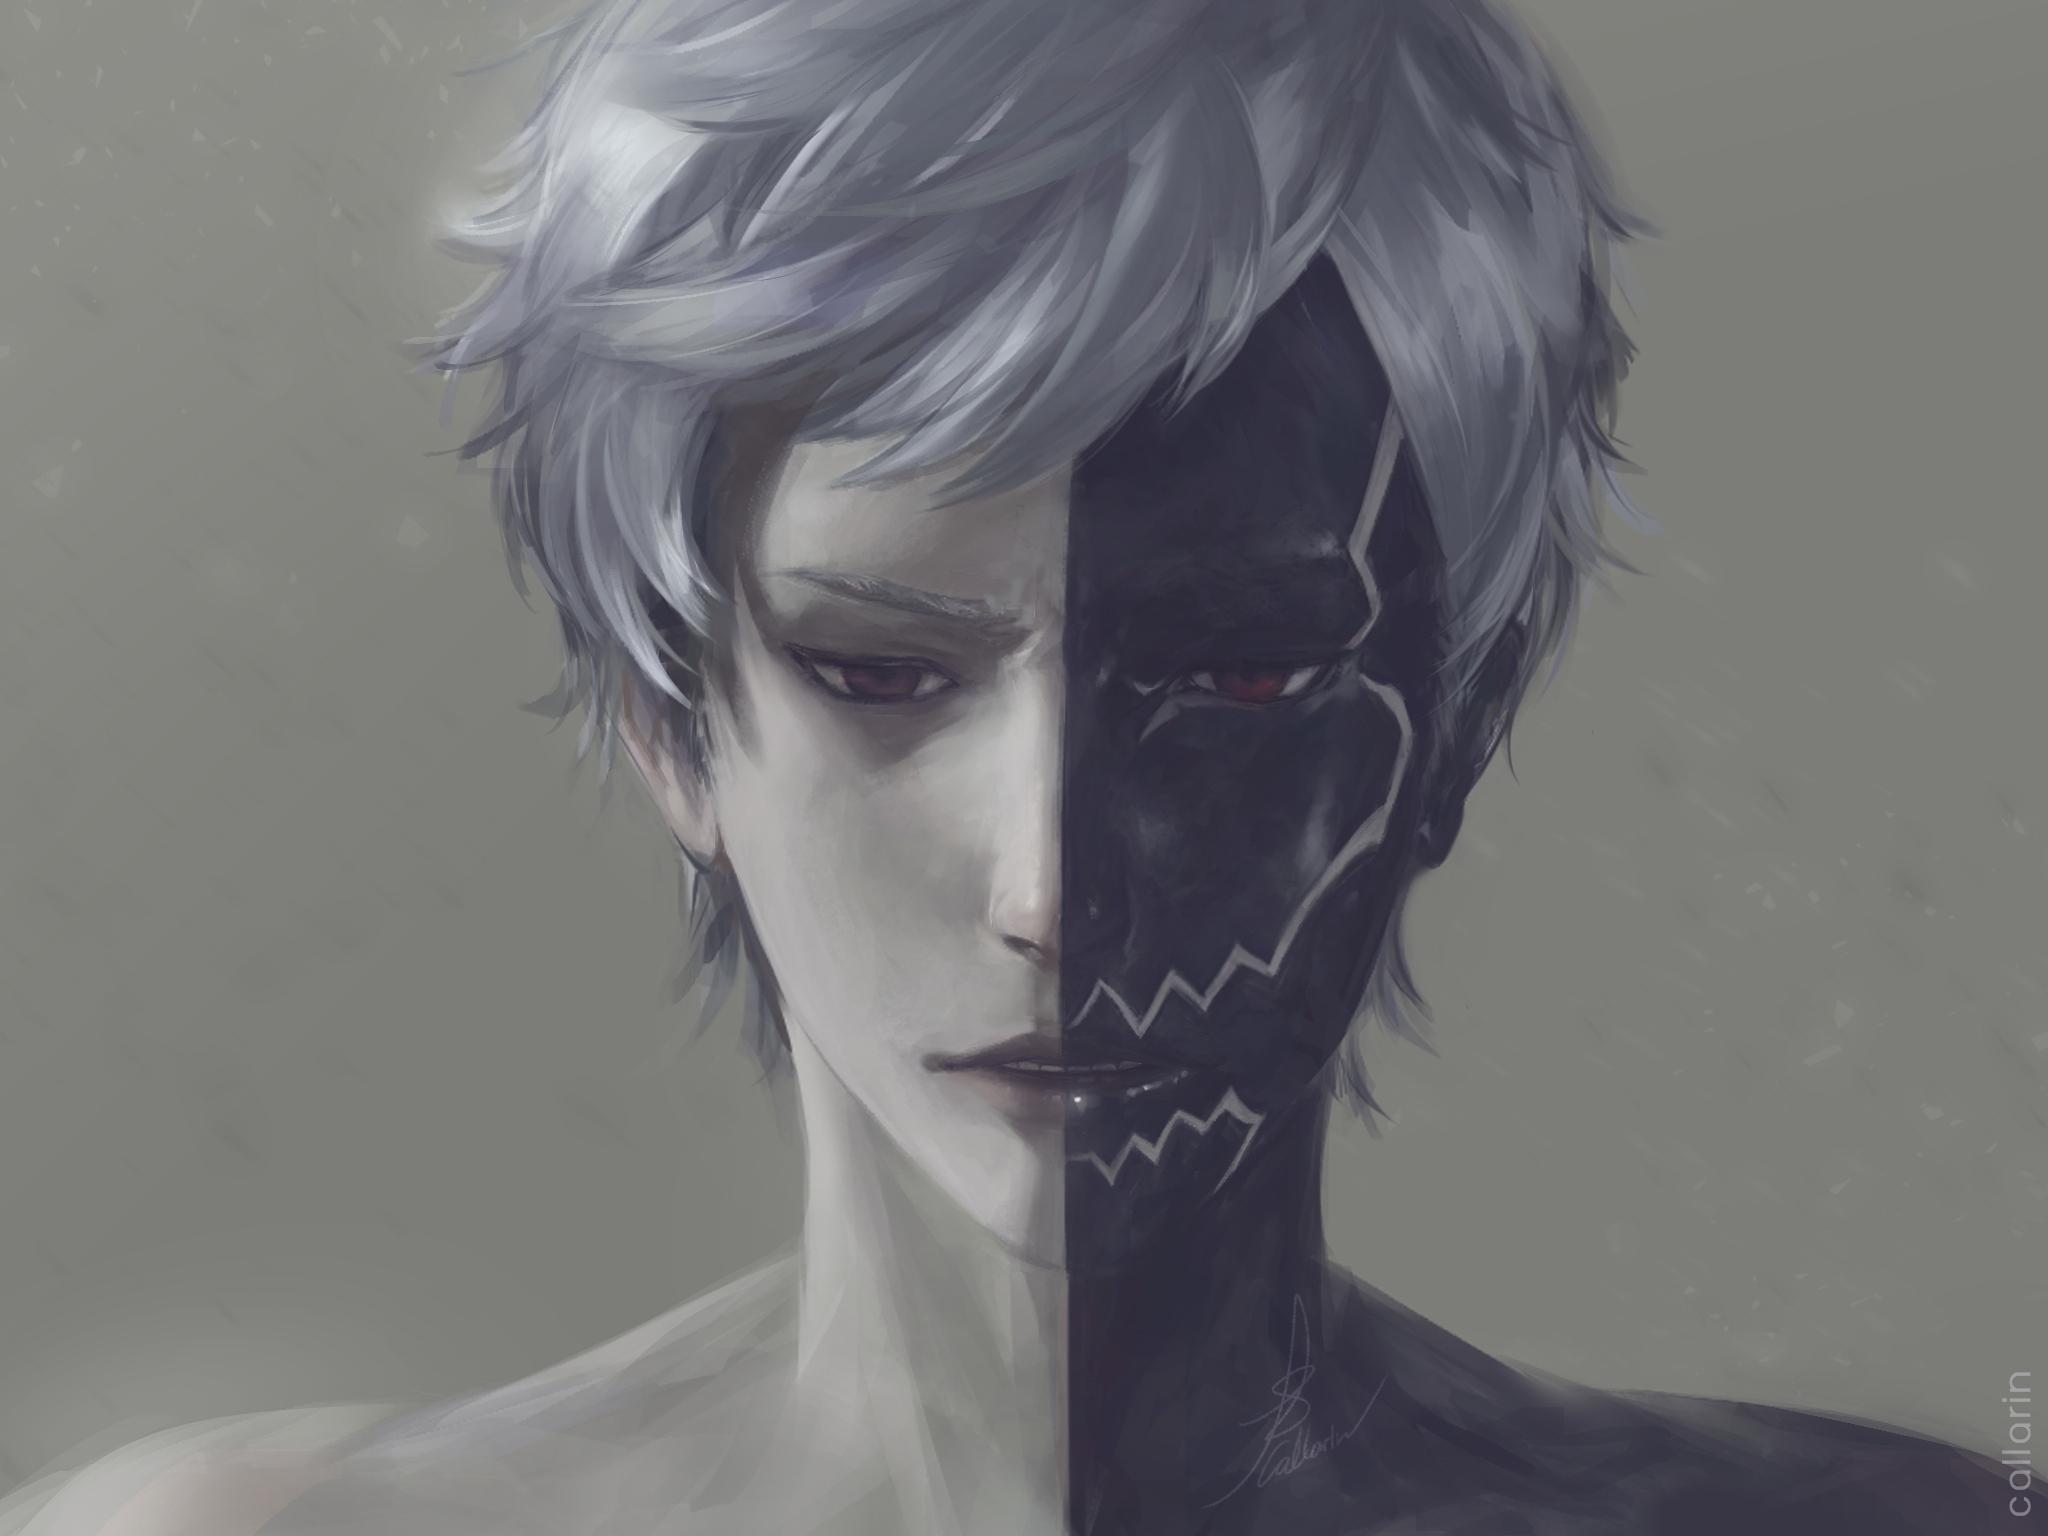 Anime 2048x1536 NieR Nier: Automata Two-Face